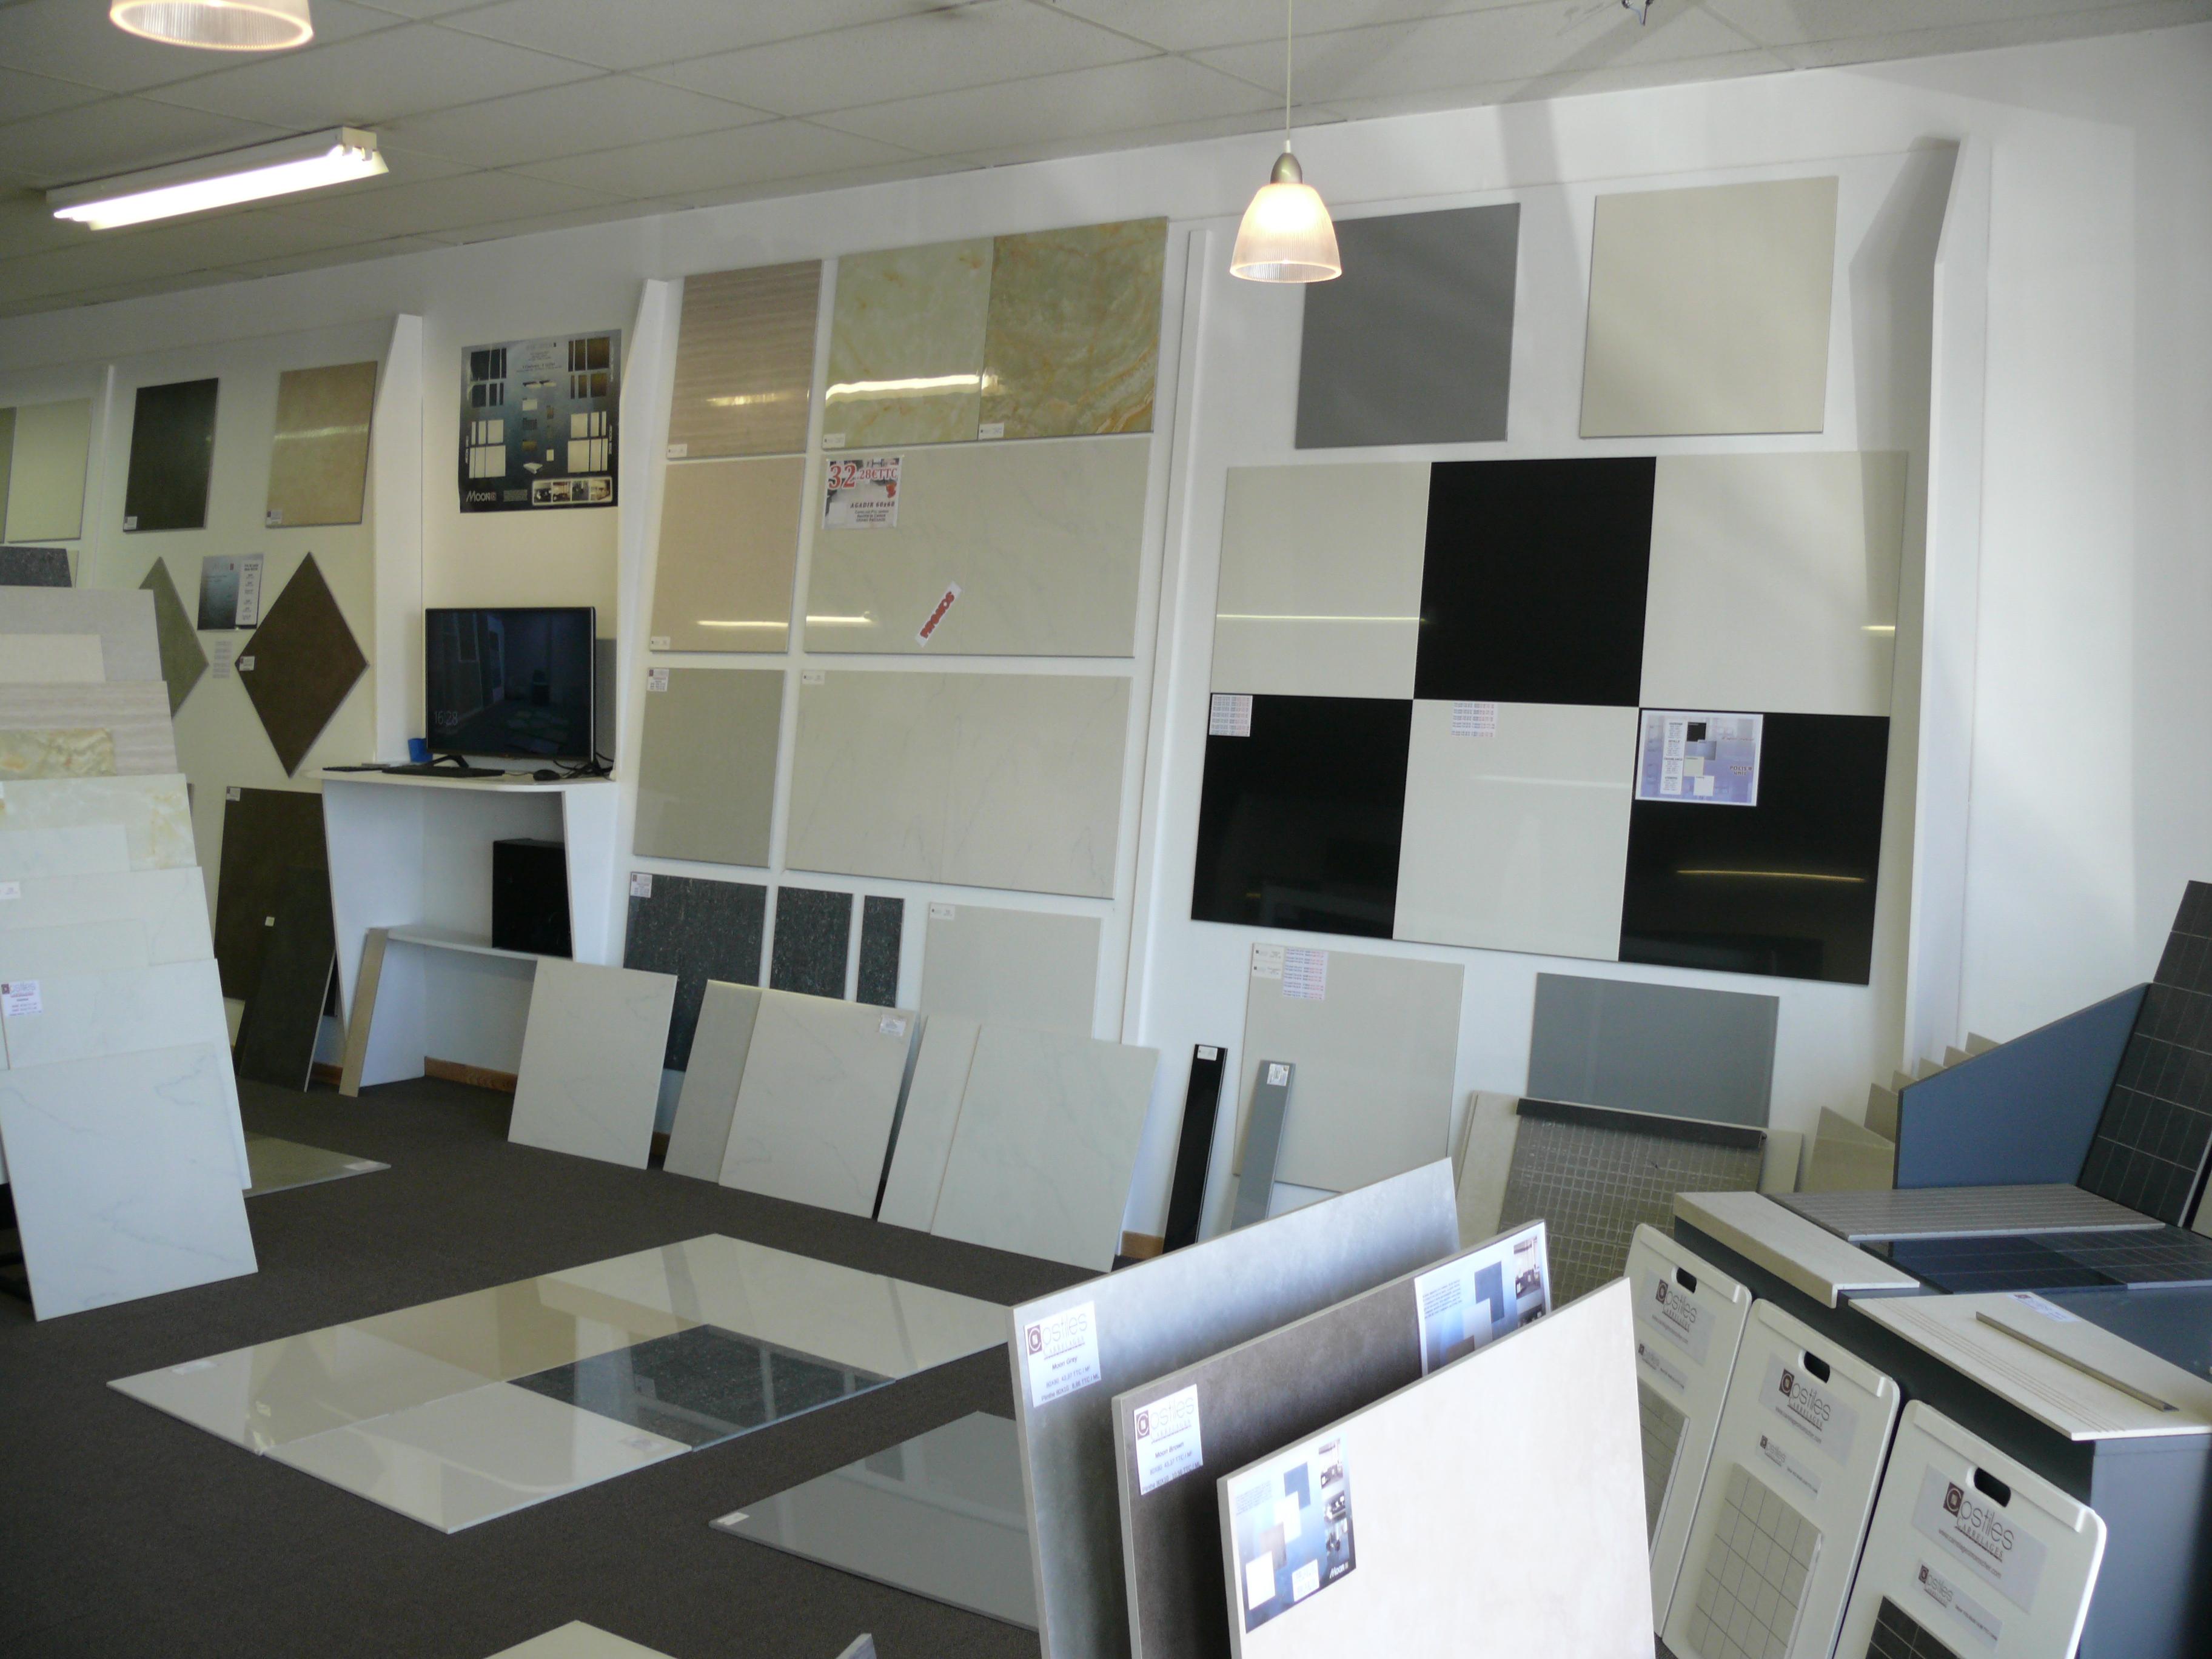 magasin de carrelage cournon d 39 auvergne. Black Bedroom Furniture Sets. Home Design Ideas